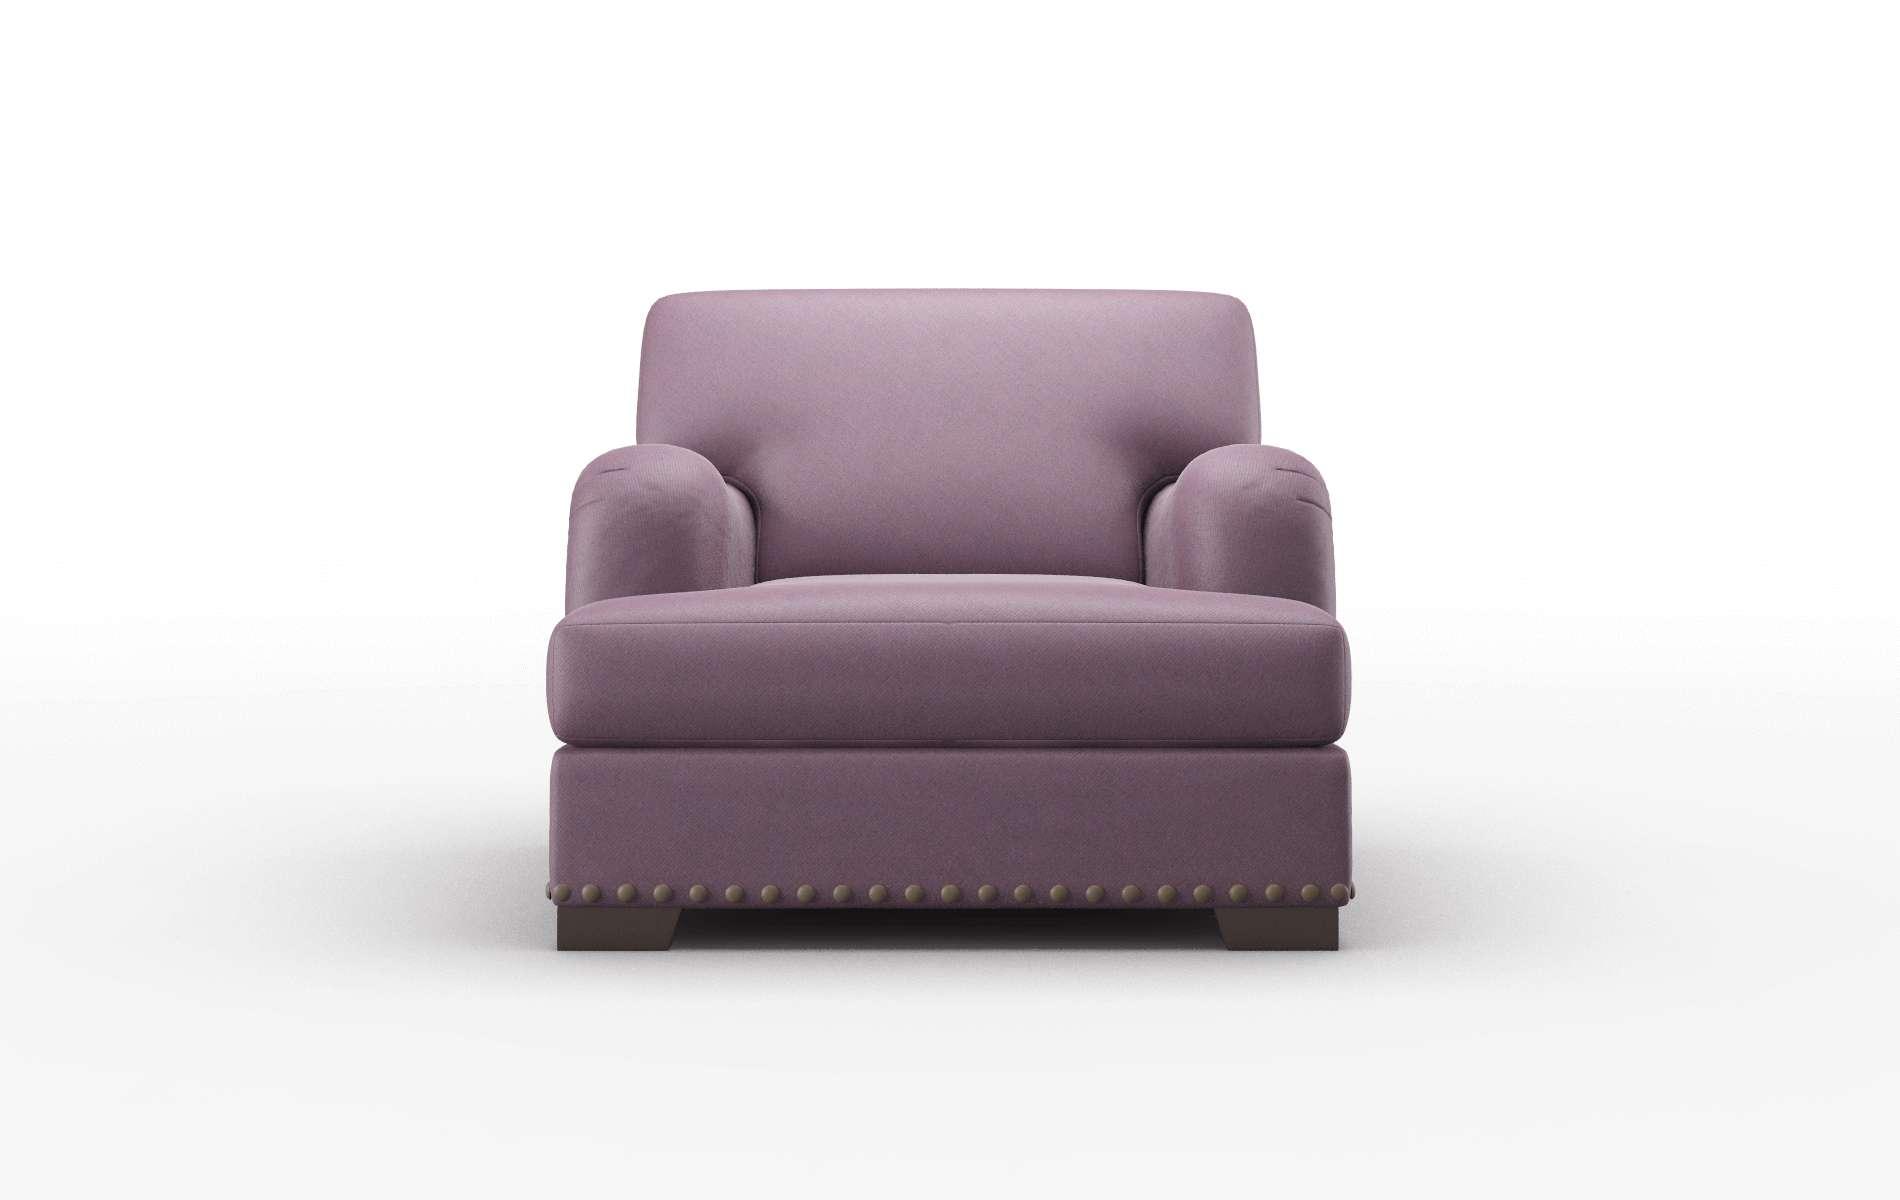 Brighton Bella Aubergine Chair espresso legs 1